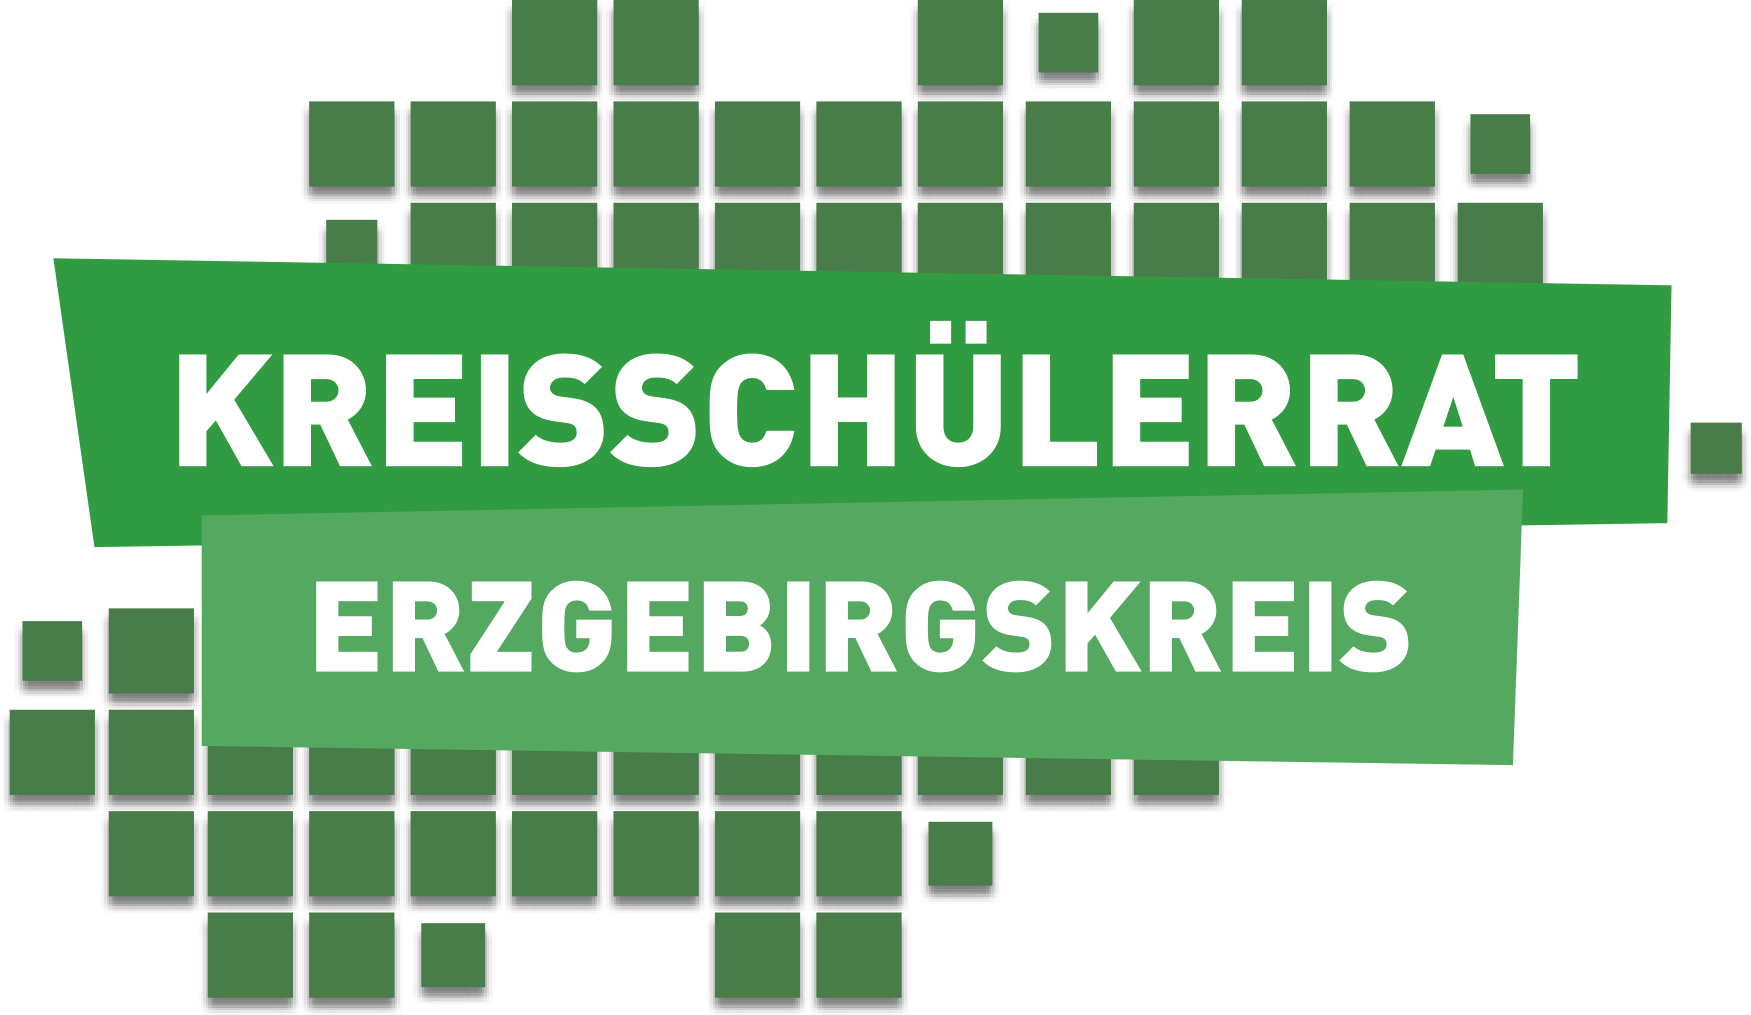 Logo des Kreisschülerrat Erzgebirgskreis